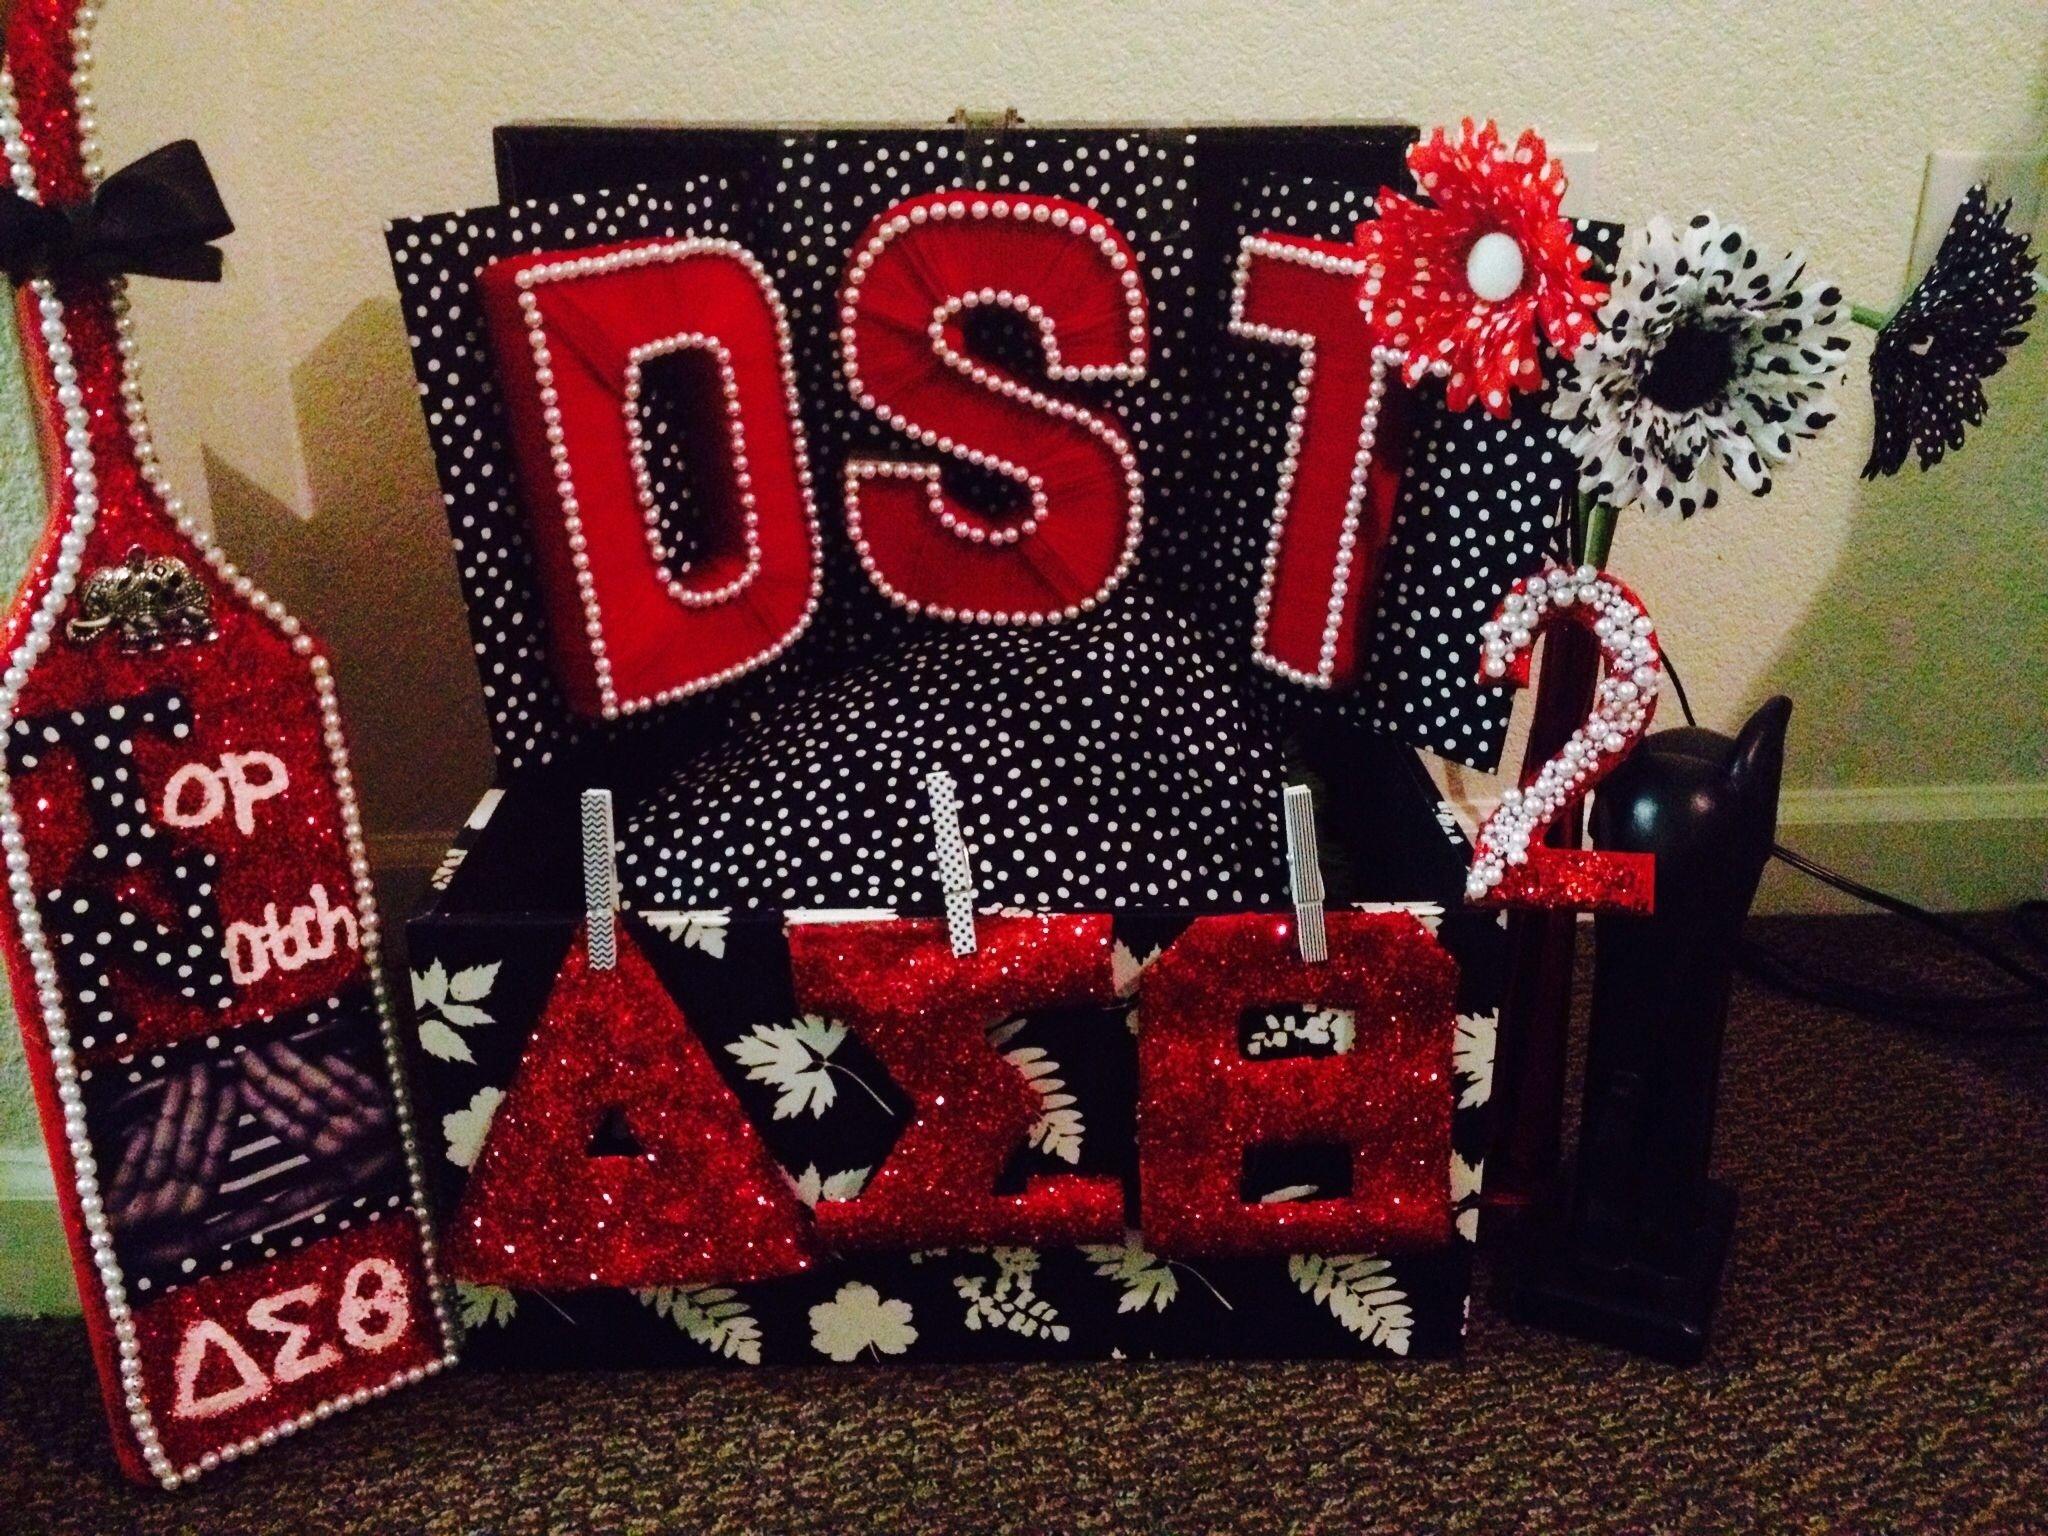 10 Best Delta Sigma Theta Gift Ideas diy probate gift dst probate crafts aoml dst pinterest 2020